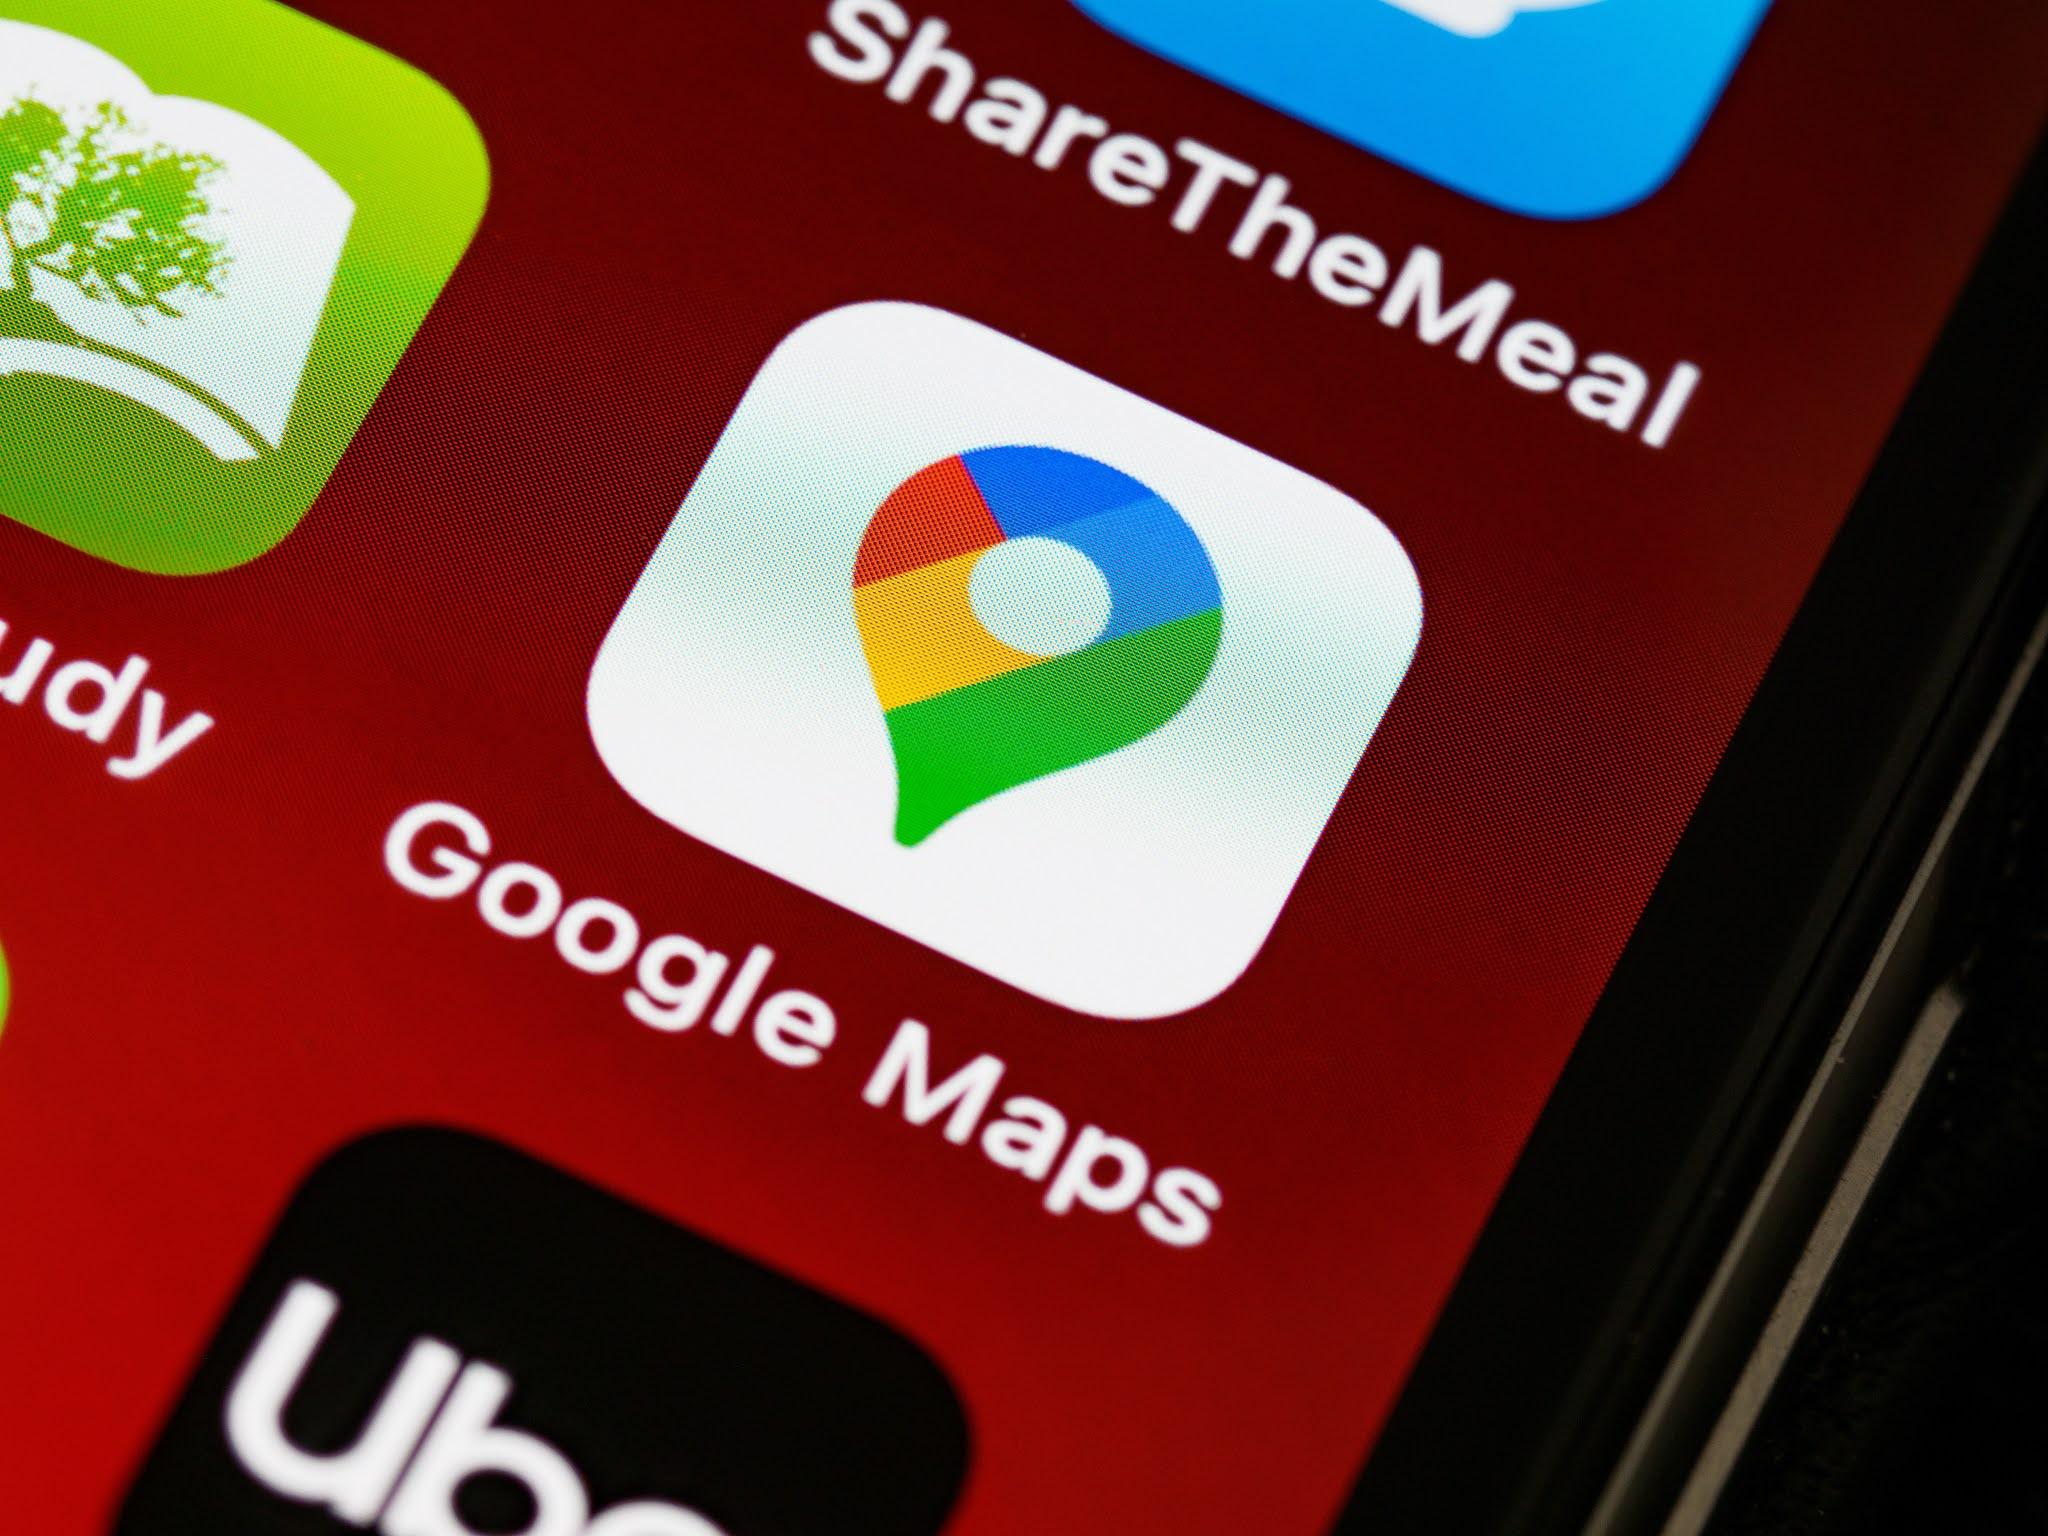 شرح الربح من خرائط جوجل Google Maps